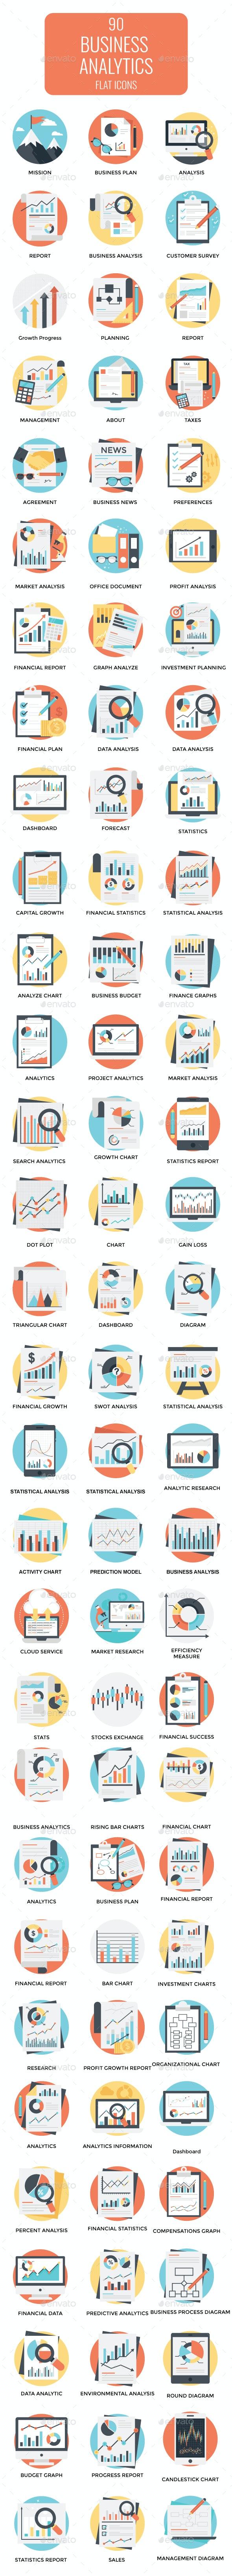 90 Flat Business Analytics Icons - Icons